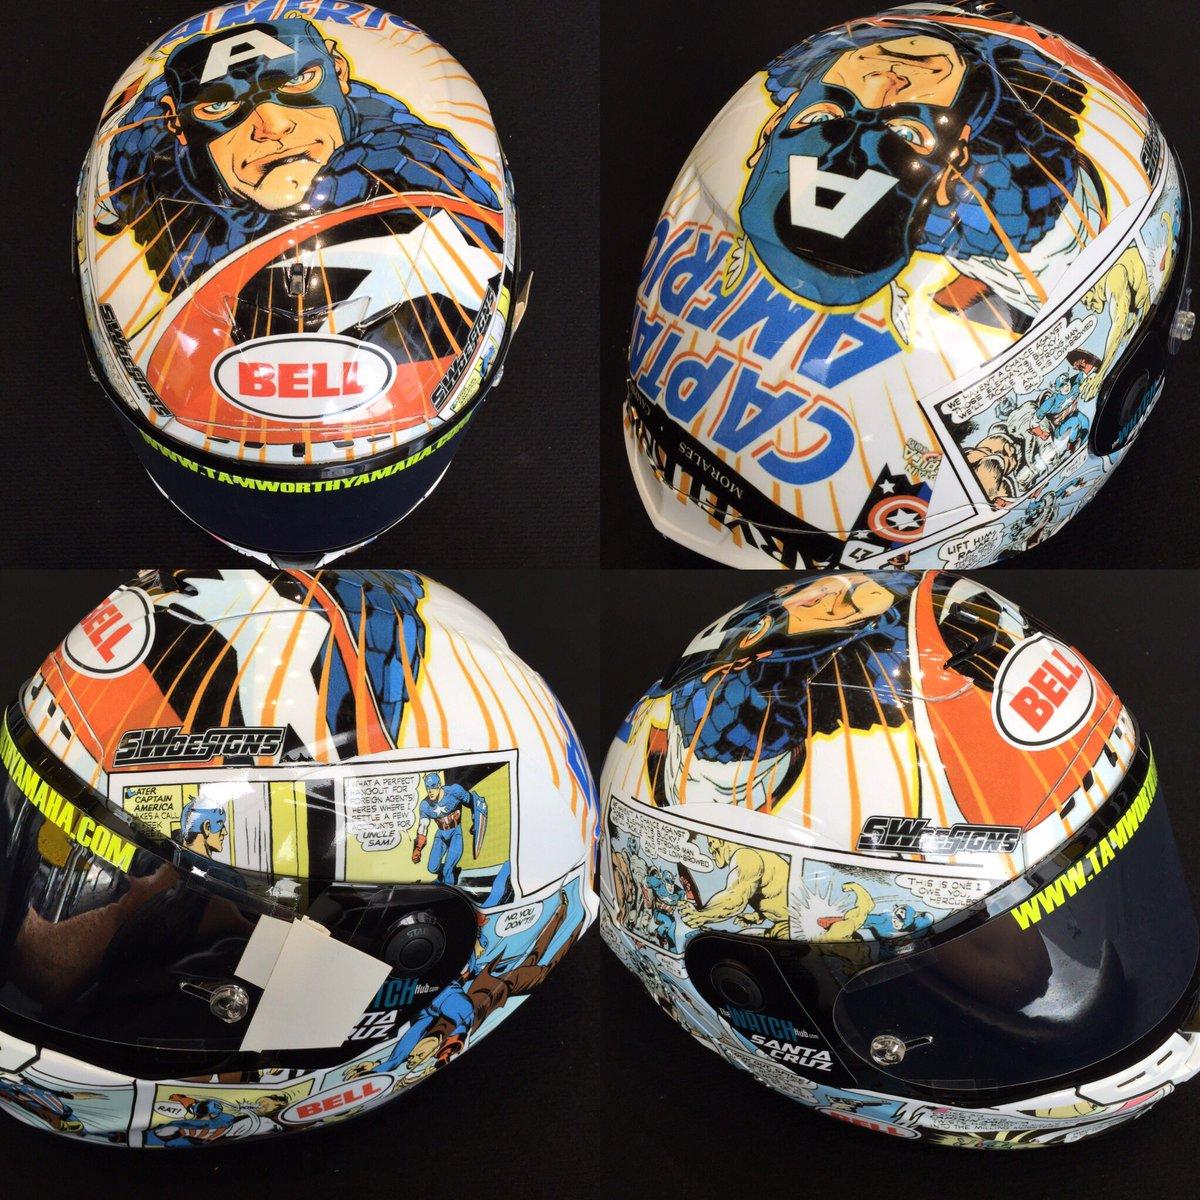 Captin America comic book.  @S_W_Designs killed this helmet. @BellPowersports https://t.co/tF6lKxH3ld